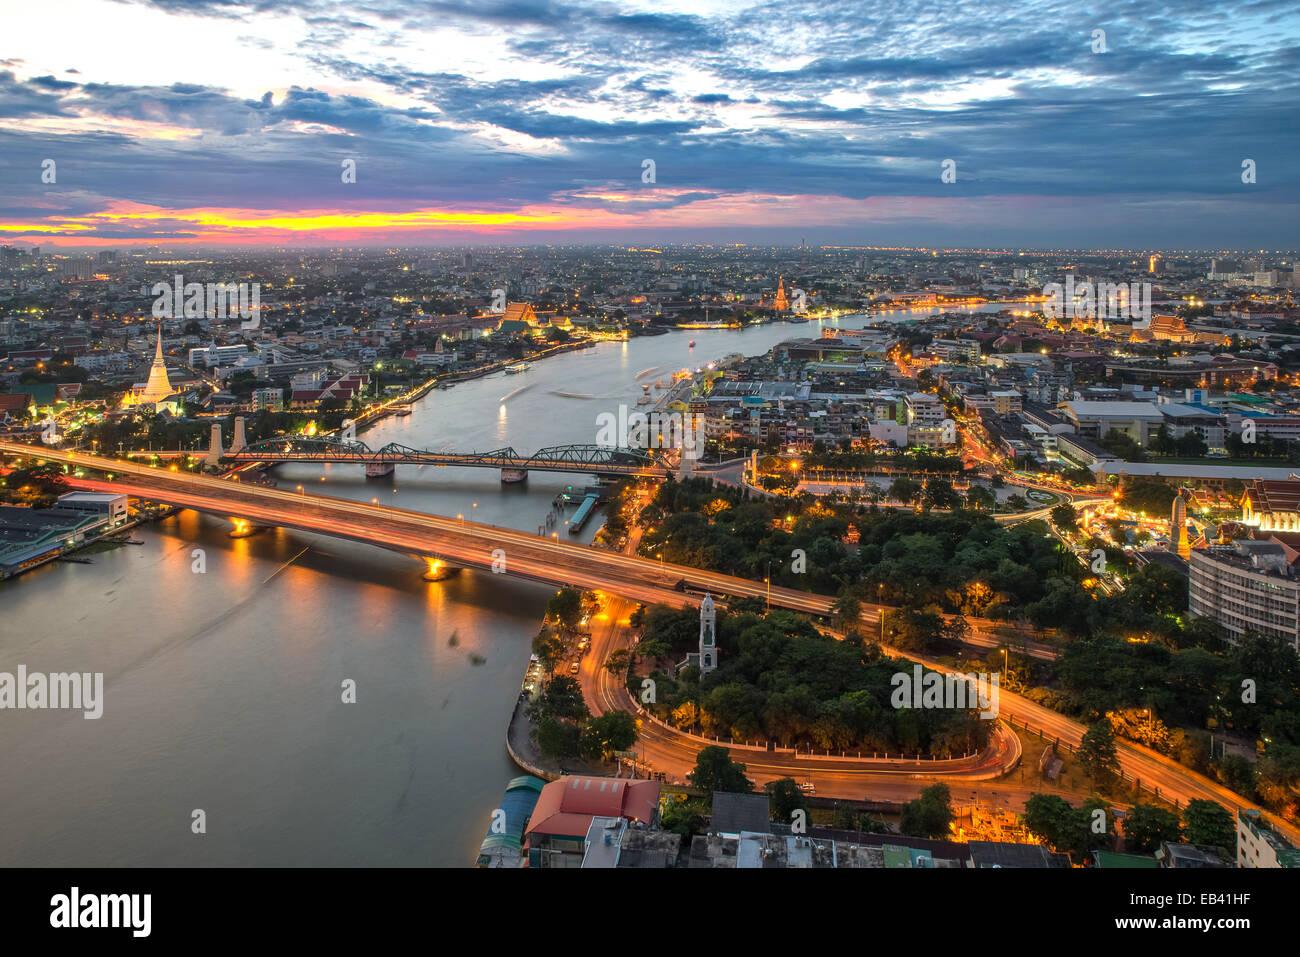 View of Bangkok city along Chao phraya River Stock Photo